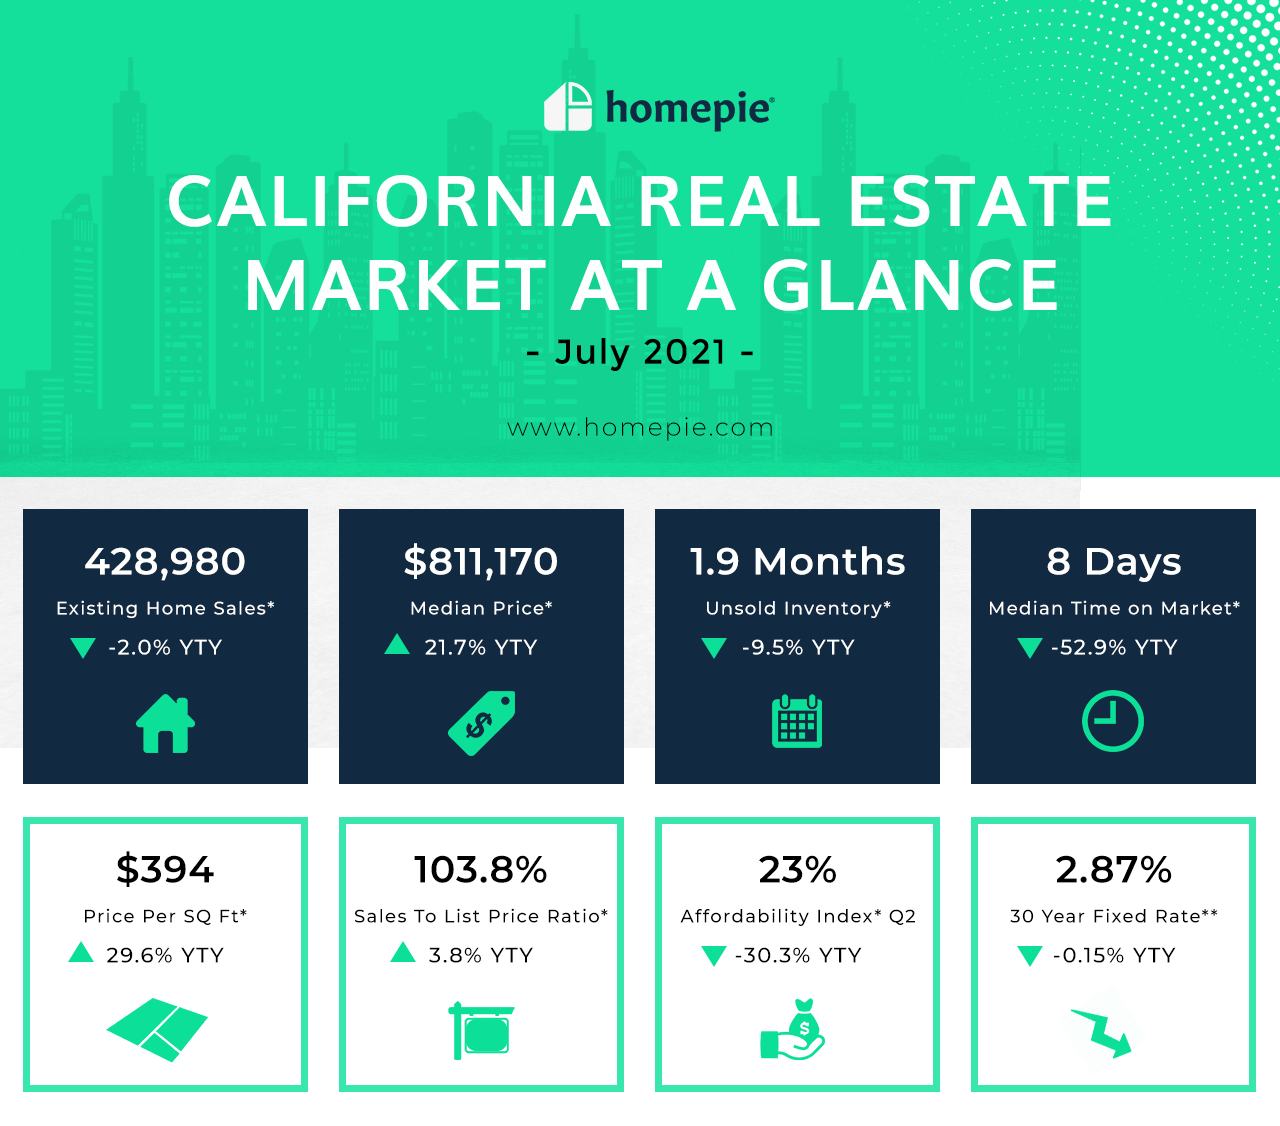 California Real Estate Market At A Glance - July 2021